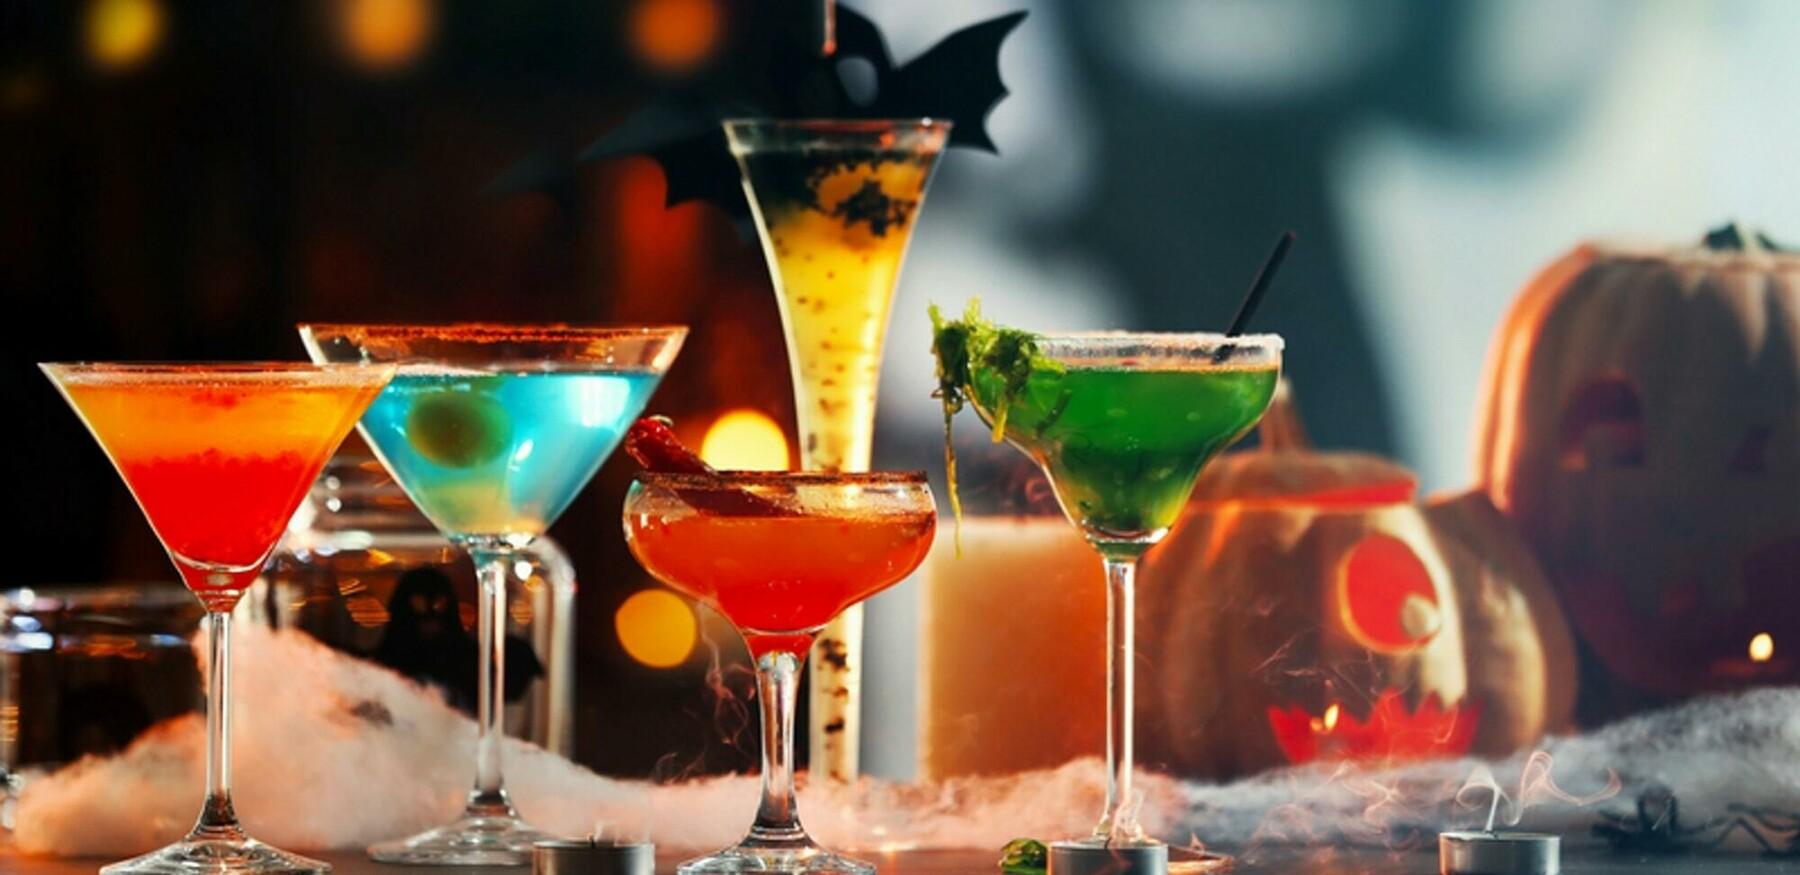 Pumpkin cocktails